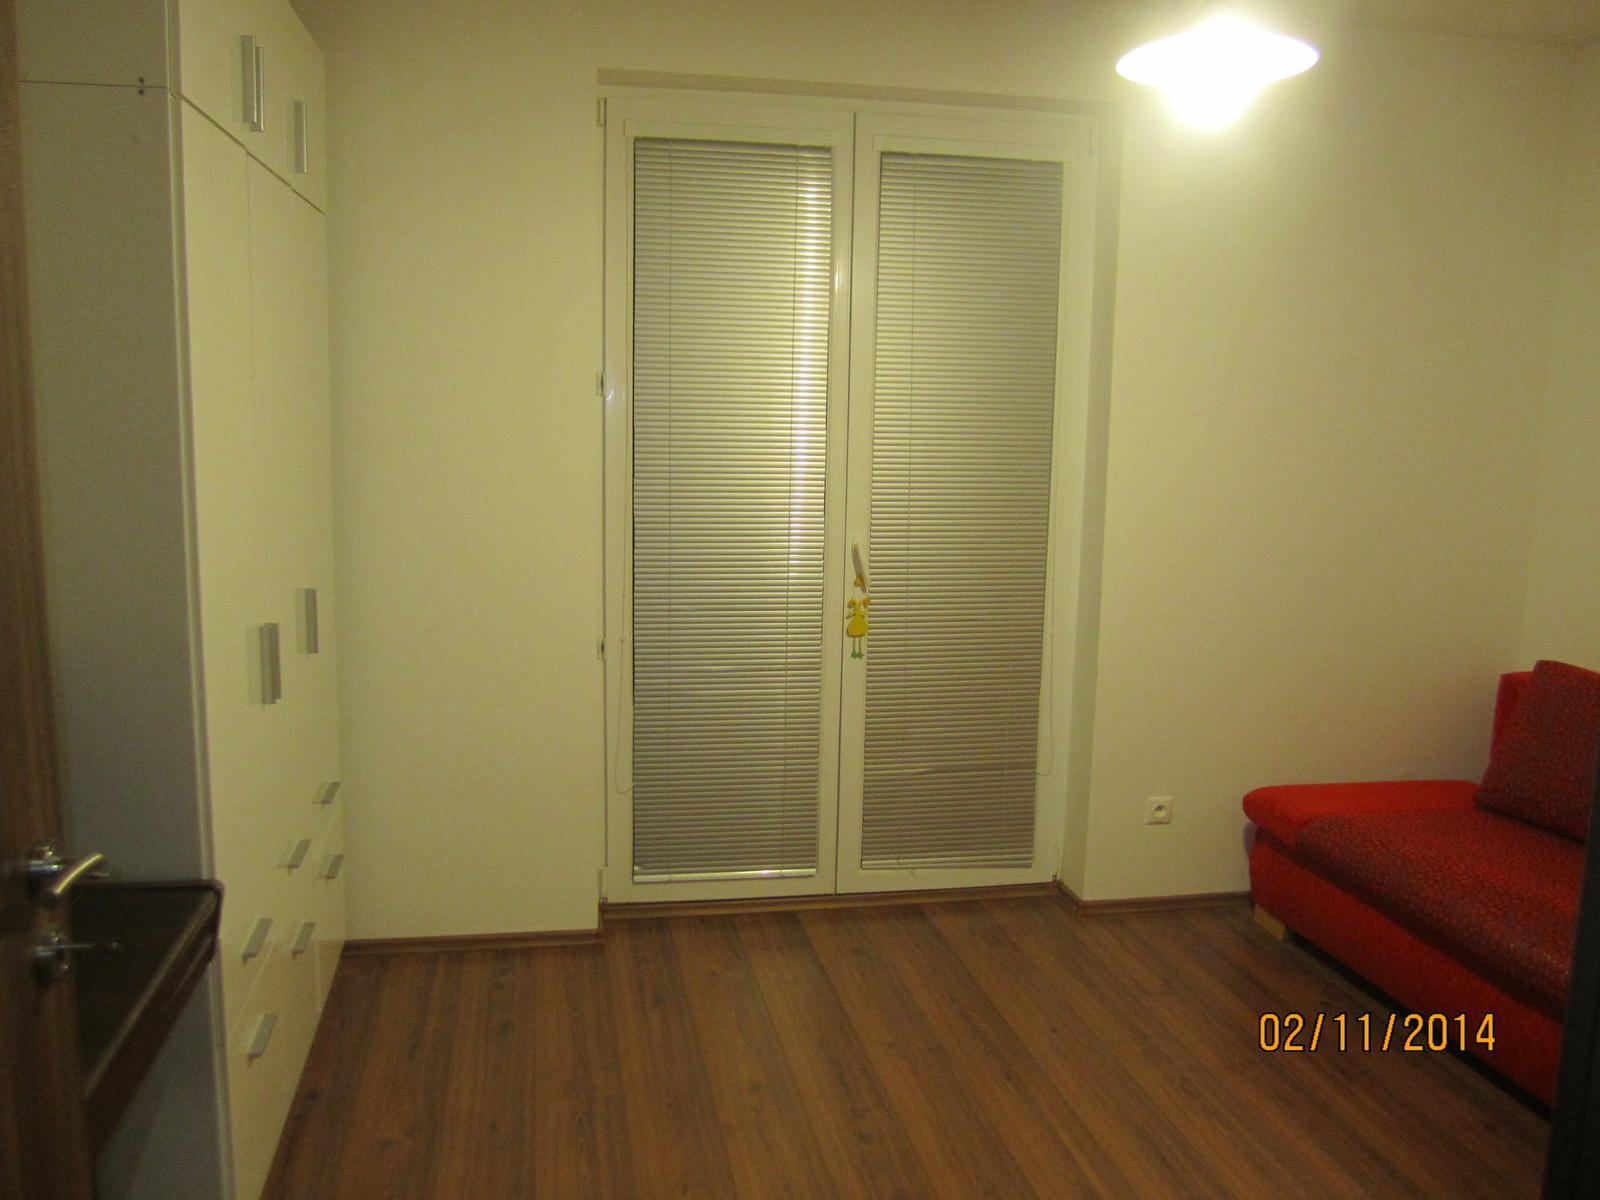 Projekt hostovska  nakoniec detska :-D - pokus o foto  od vchod. dveri na sirku.... tam napravo bude potom stol, ako vo verzii 1, na okna pribudnu dekoracne zavesy po bokoch, len musim kupit kolajnicu v IKEA